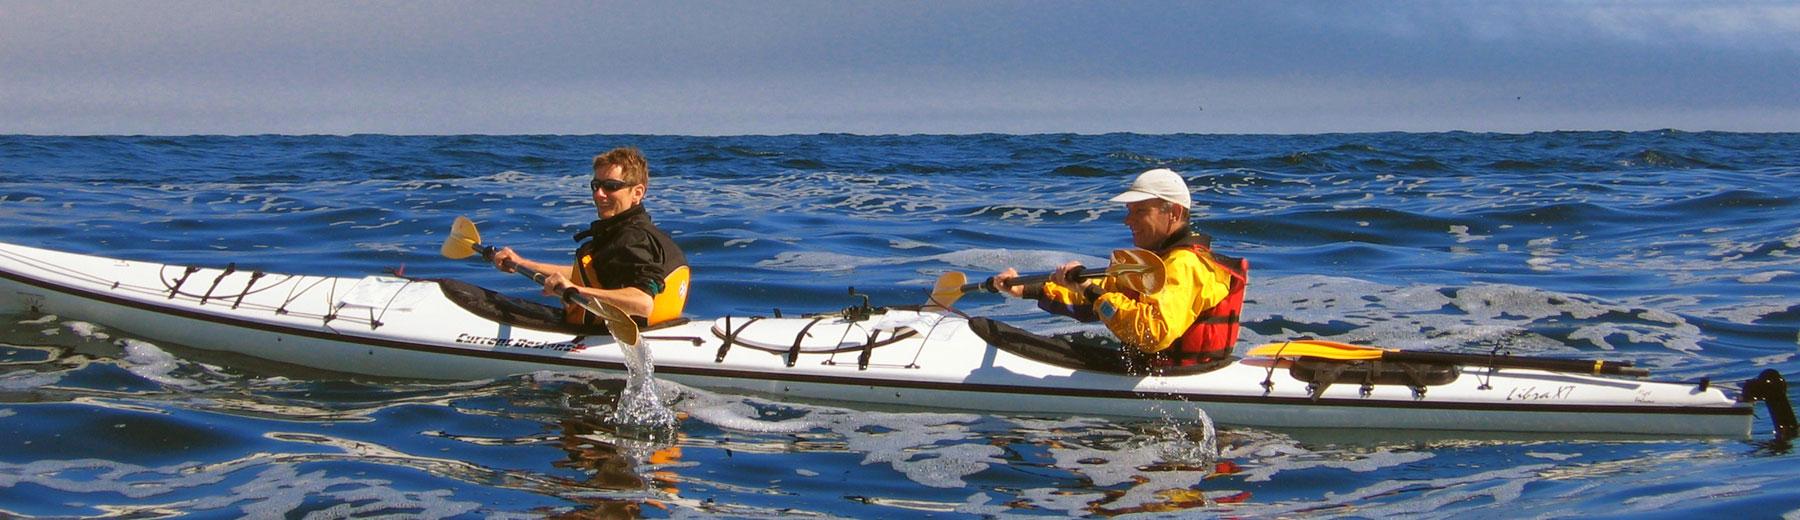 Double kayak, double the fun